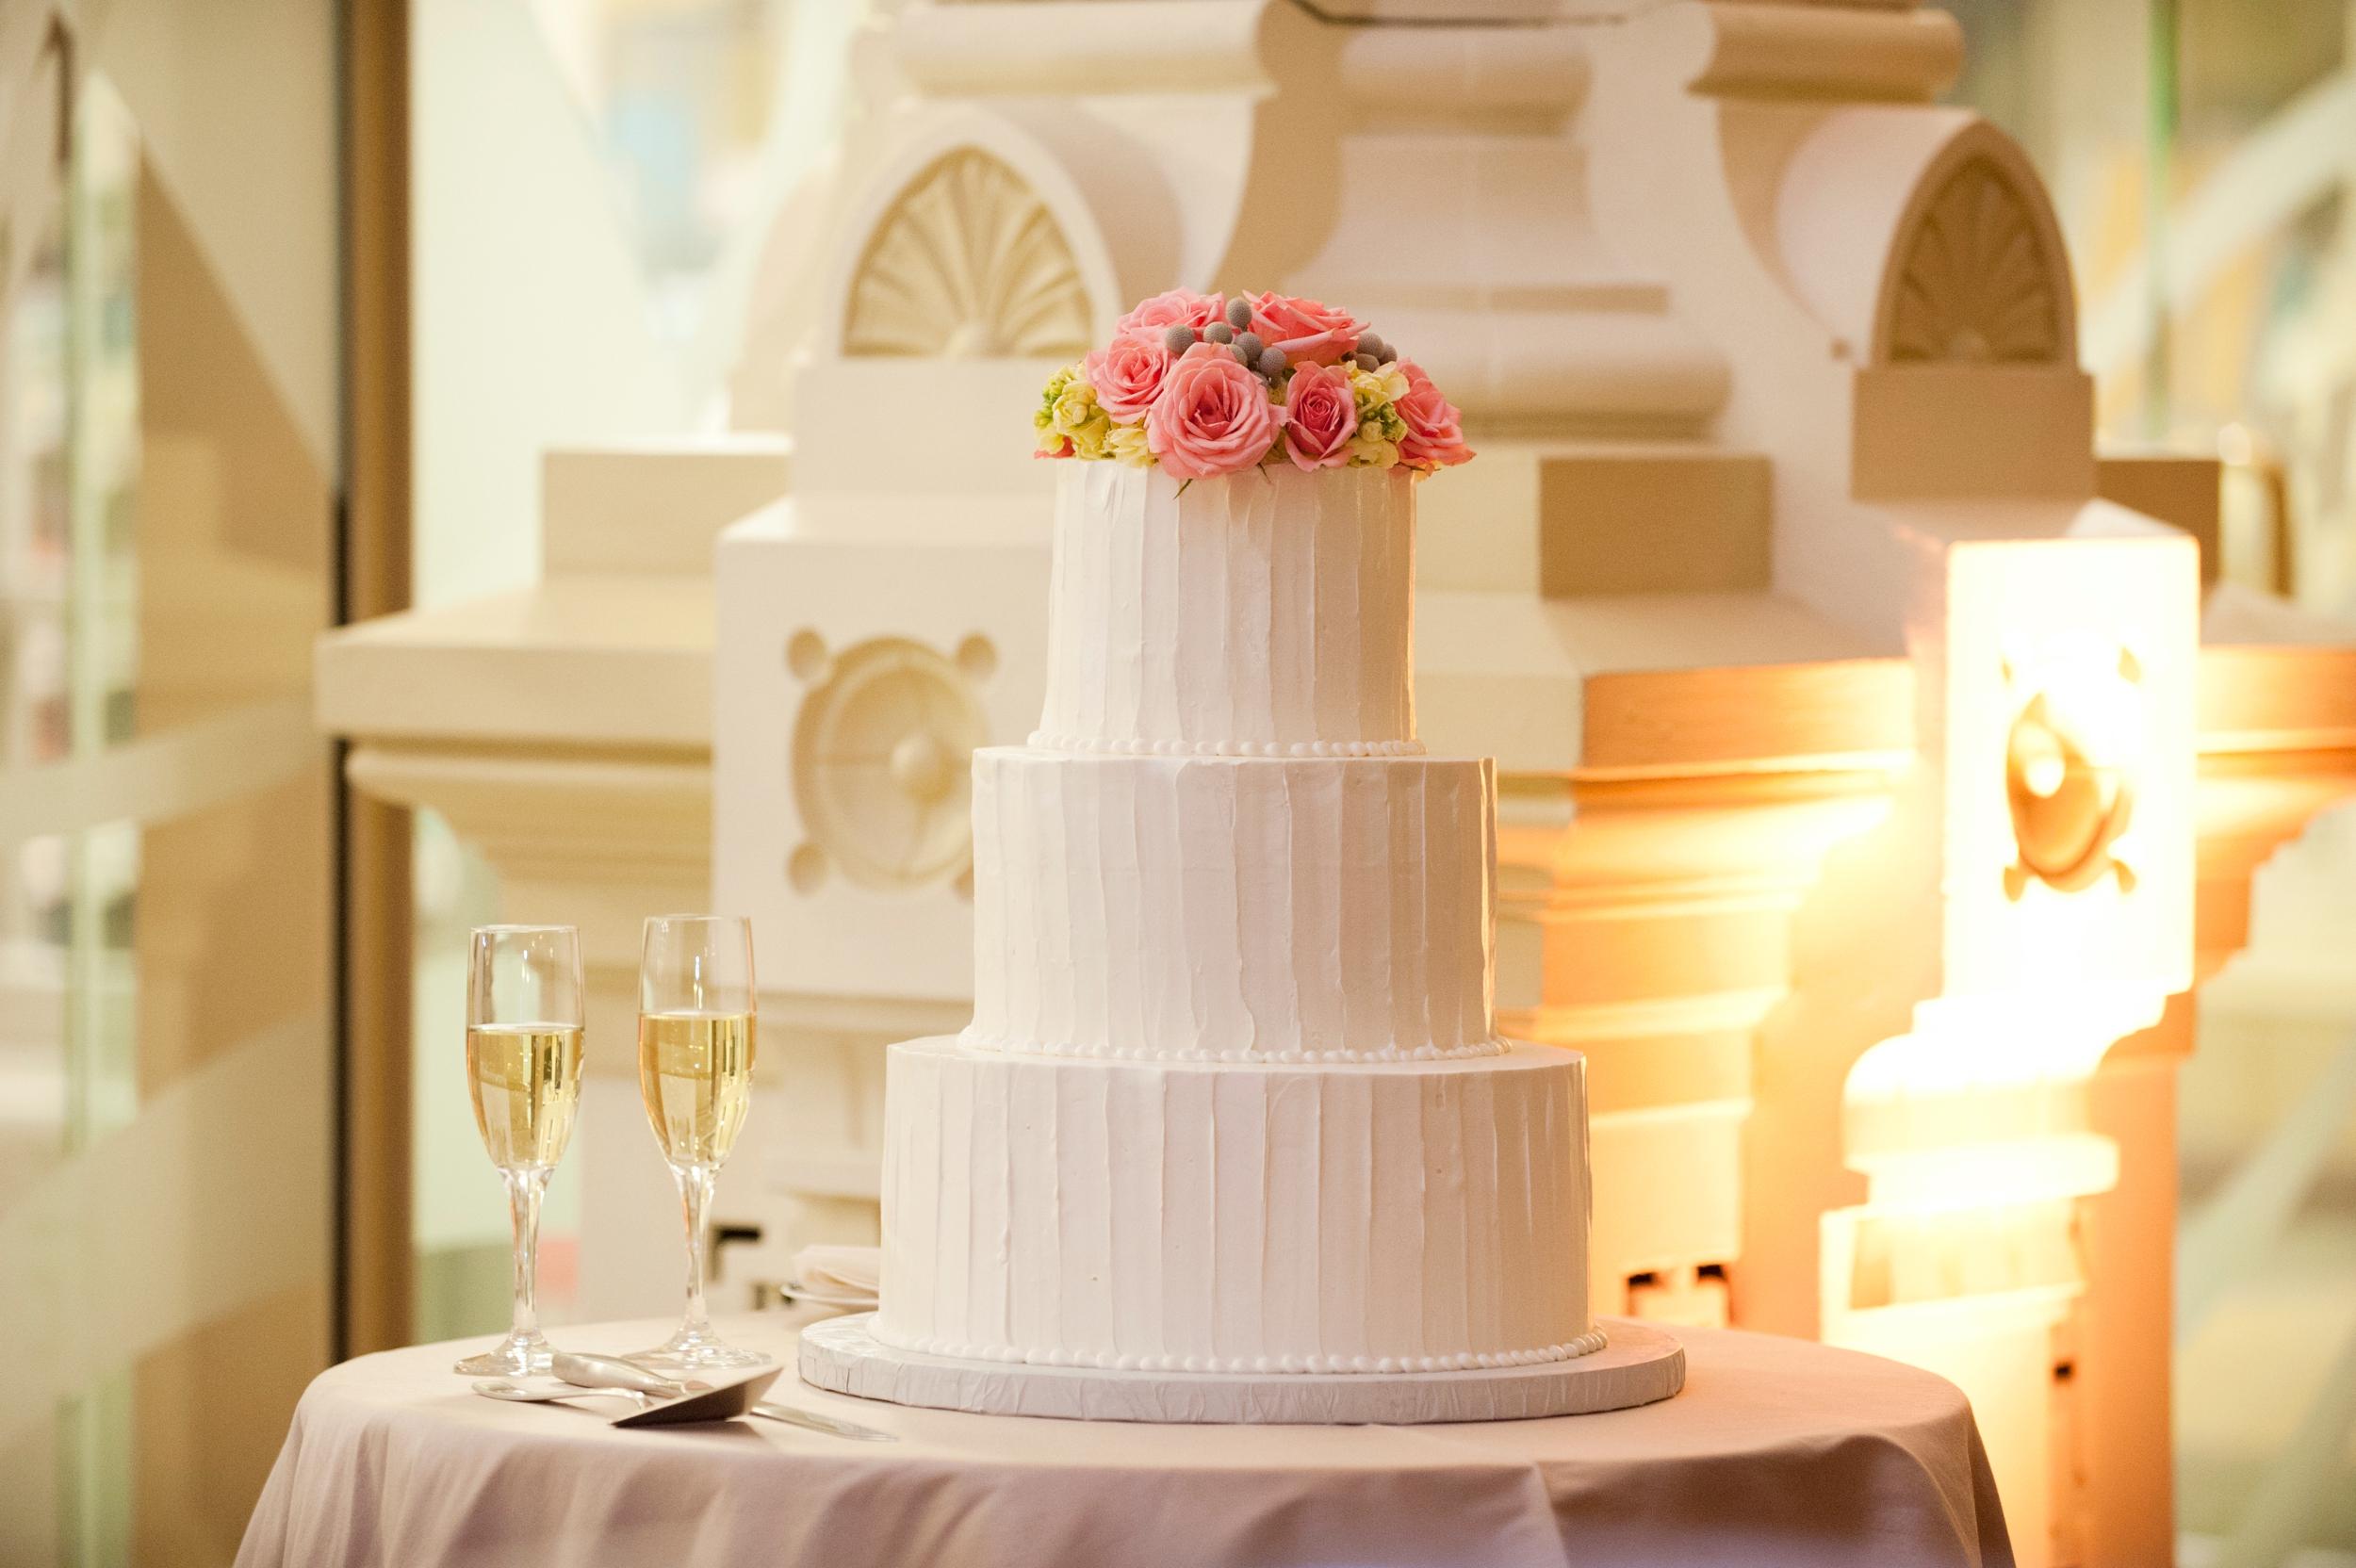 45-merts-wedding-cake.JPG